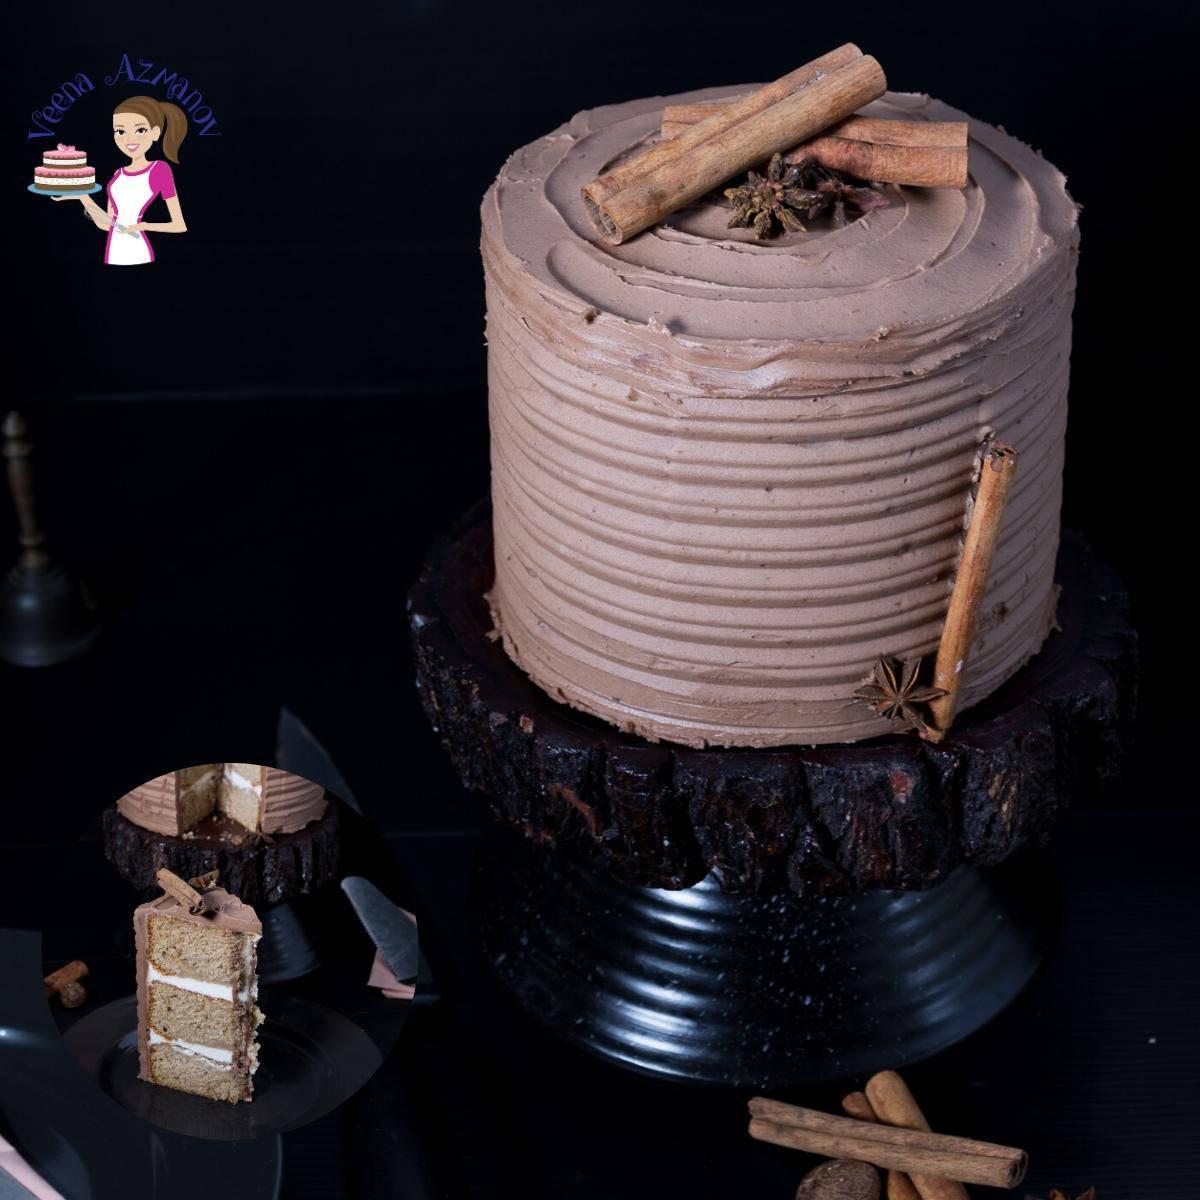 Homemade Cake Recipe with Cardamom flavor and Mocha Buttercream